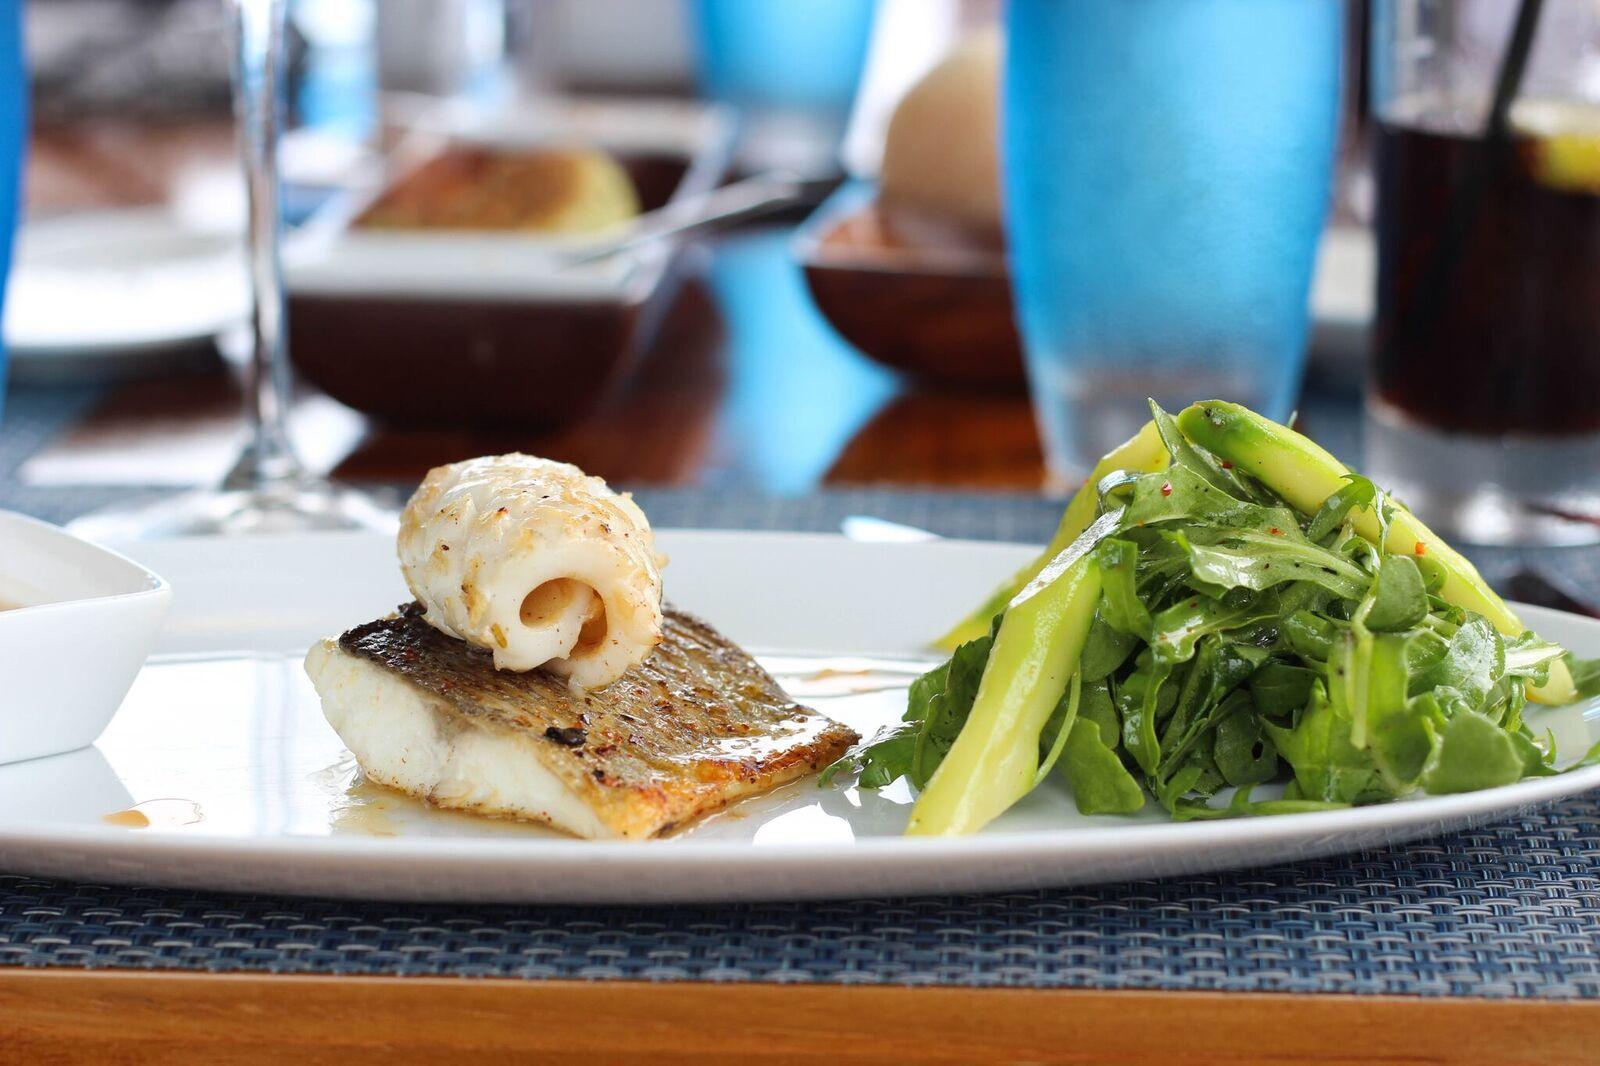 cmri_calamari-and-seabass-served-with-rocket-and-aspargus_credit-sabrina-chakici